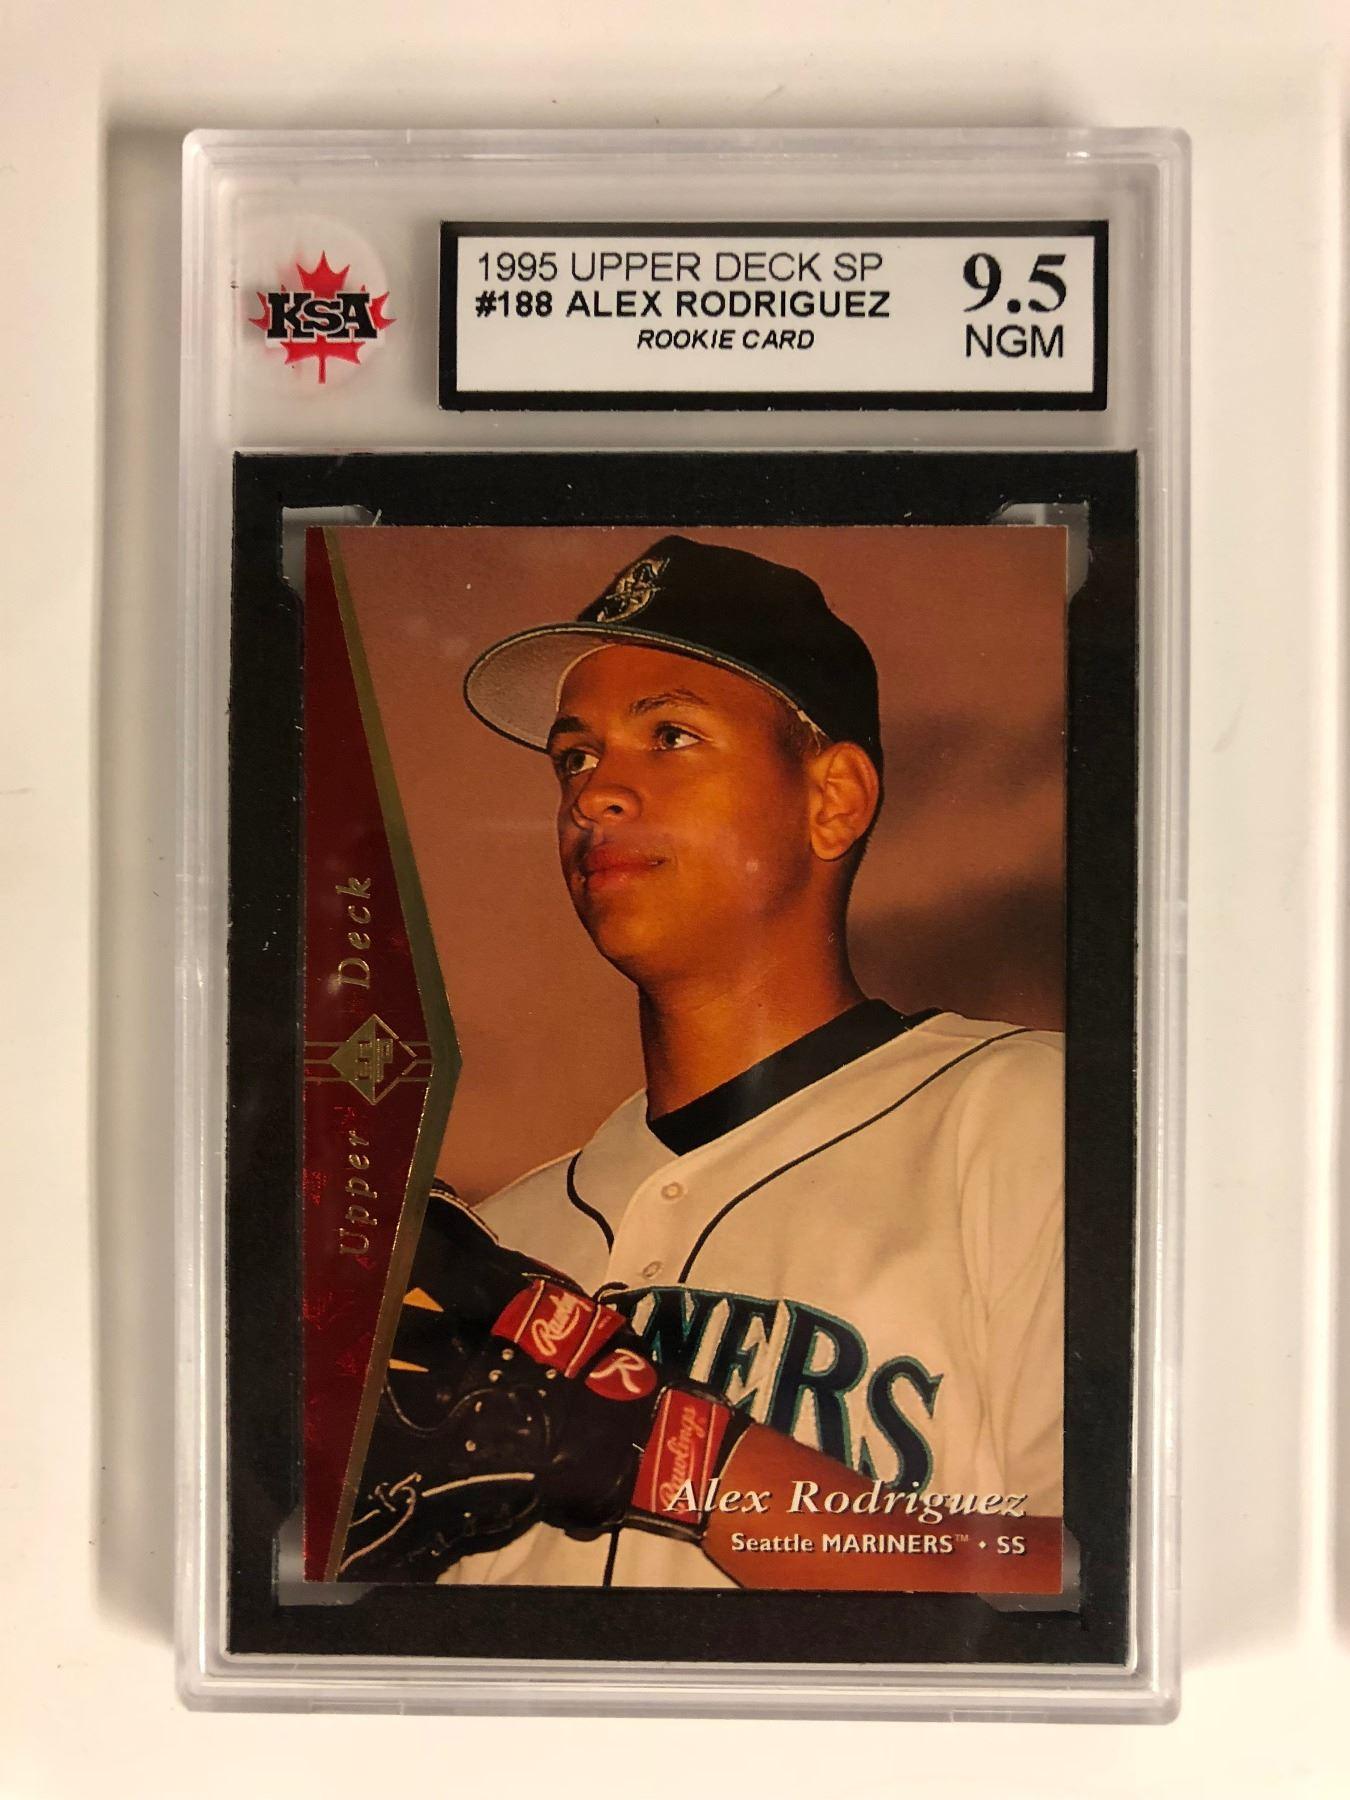 1995 Upper Deck Sp 188 Alex Rodriguez Rookie Card 95 Ngm Ksa